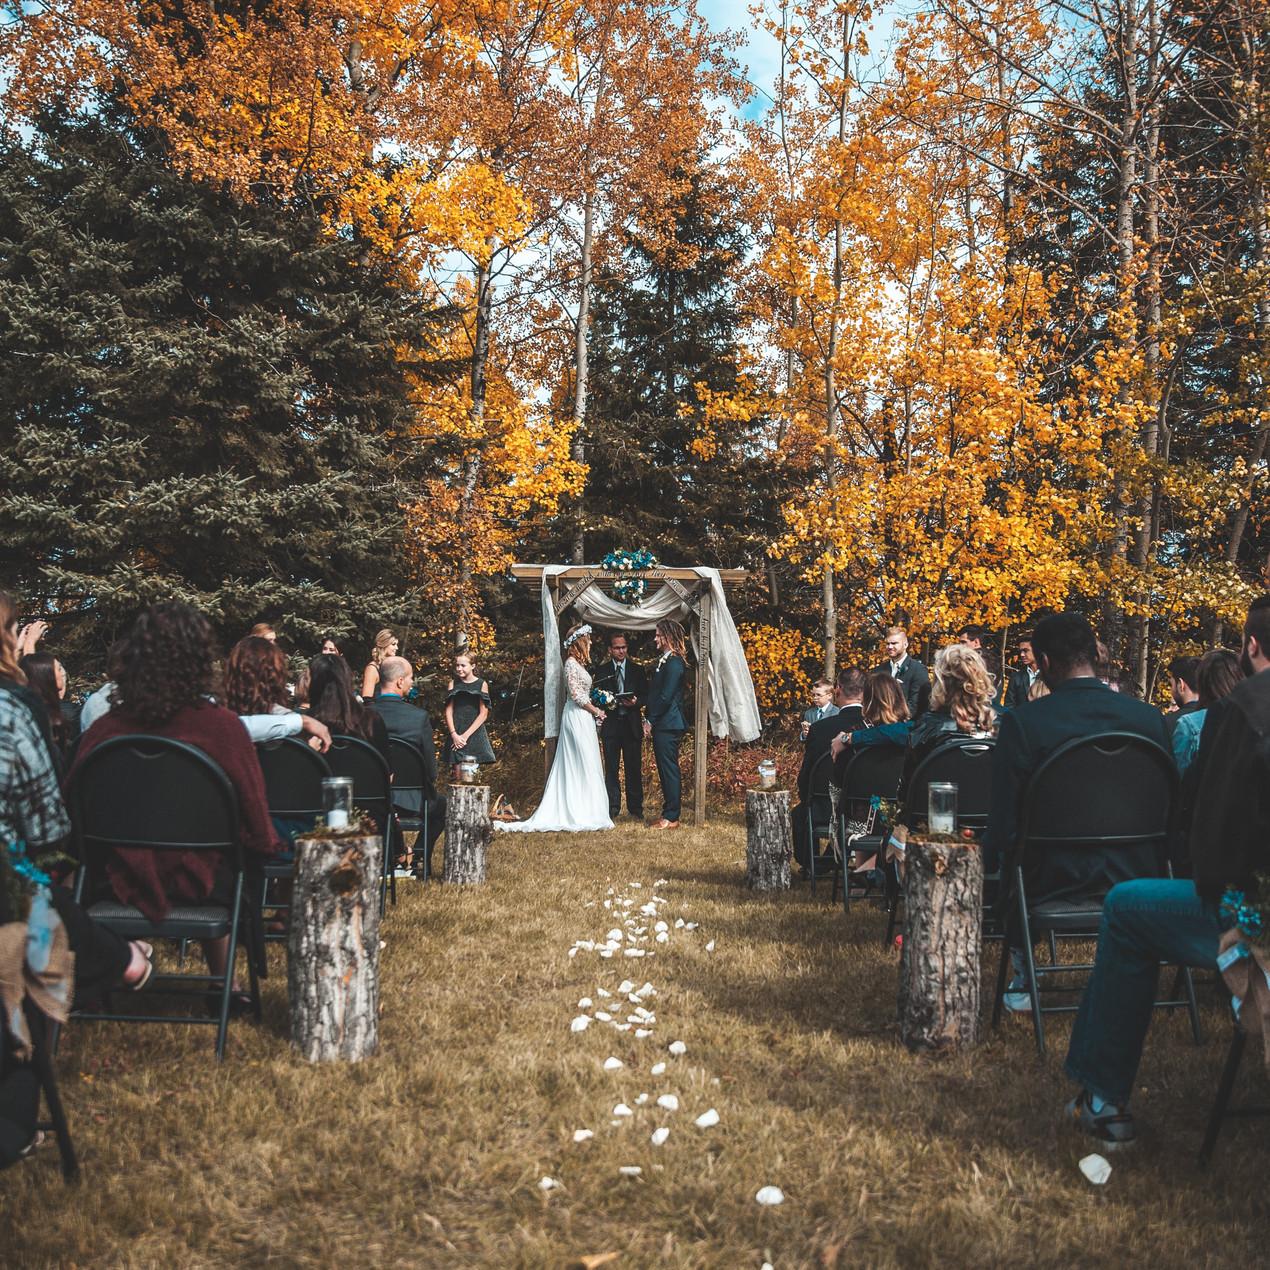 Outdoor micro wedding ceremony